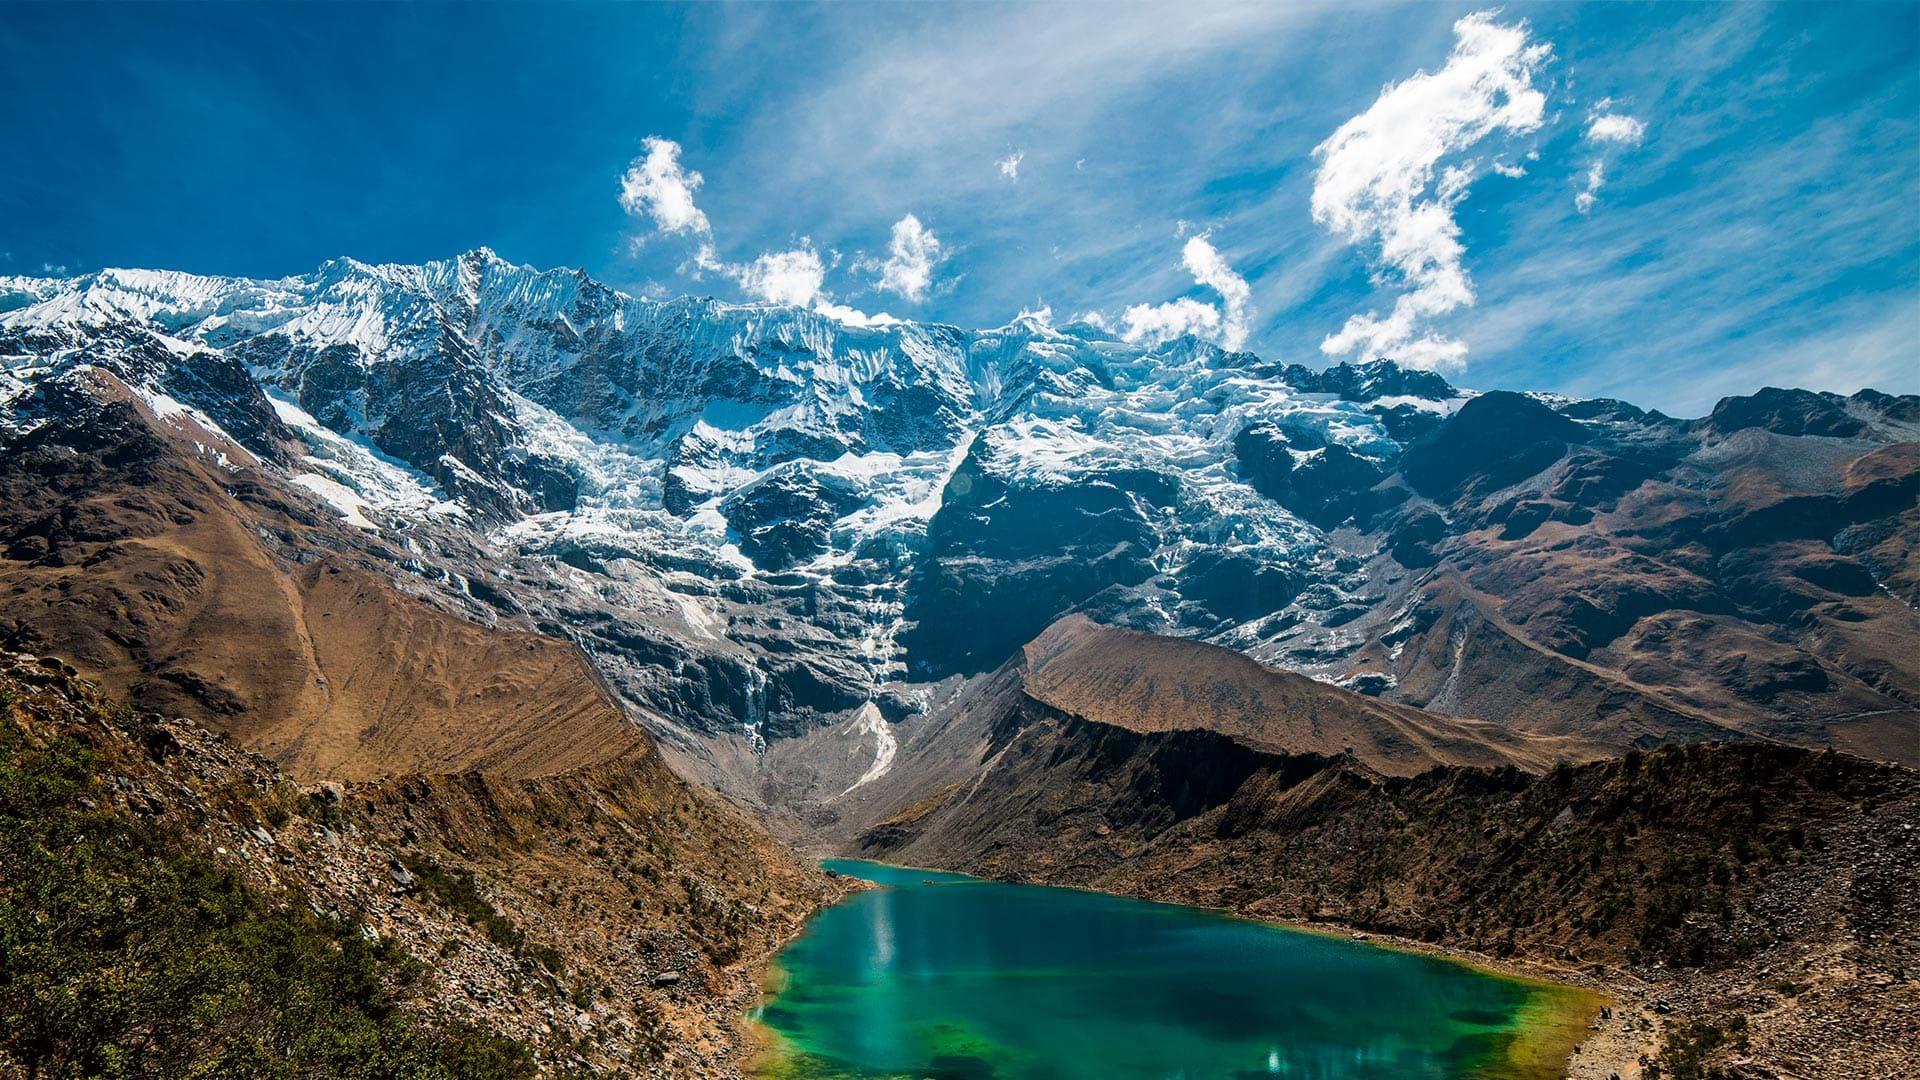 Mount Ausangate, sacred mountain